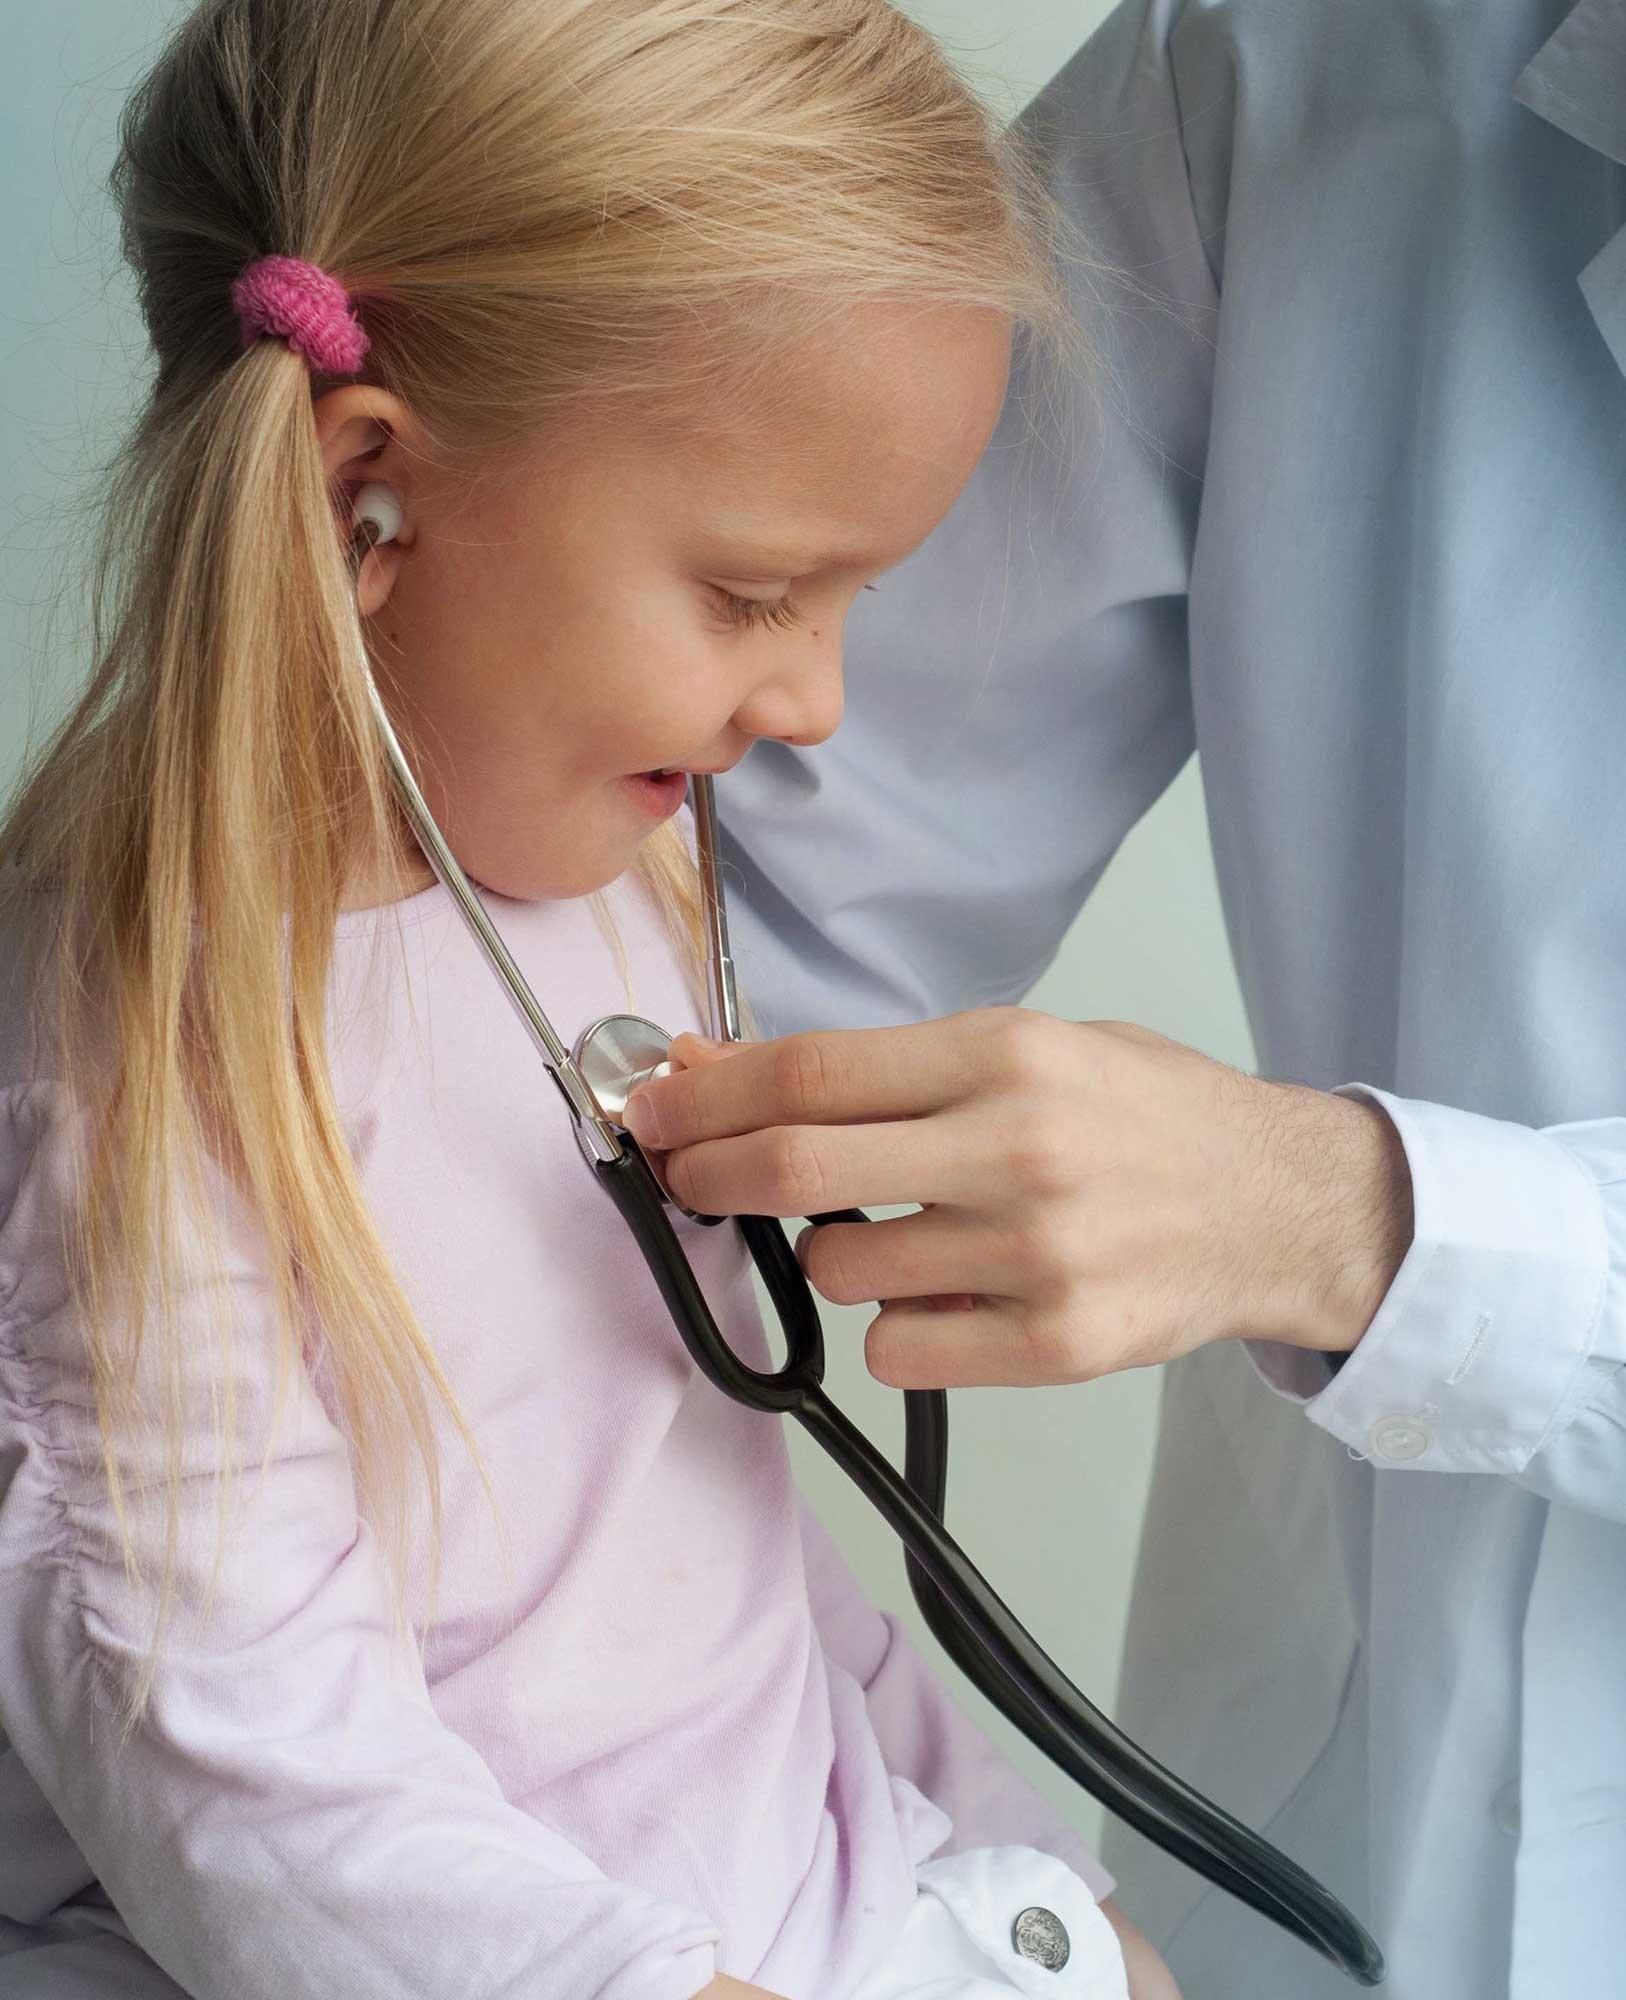 PrimeWay Life & Health Insurance